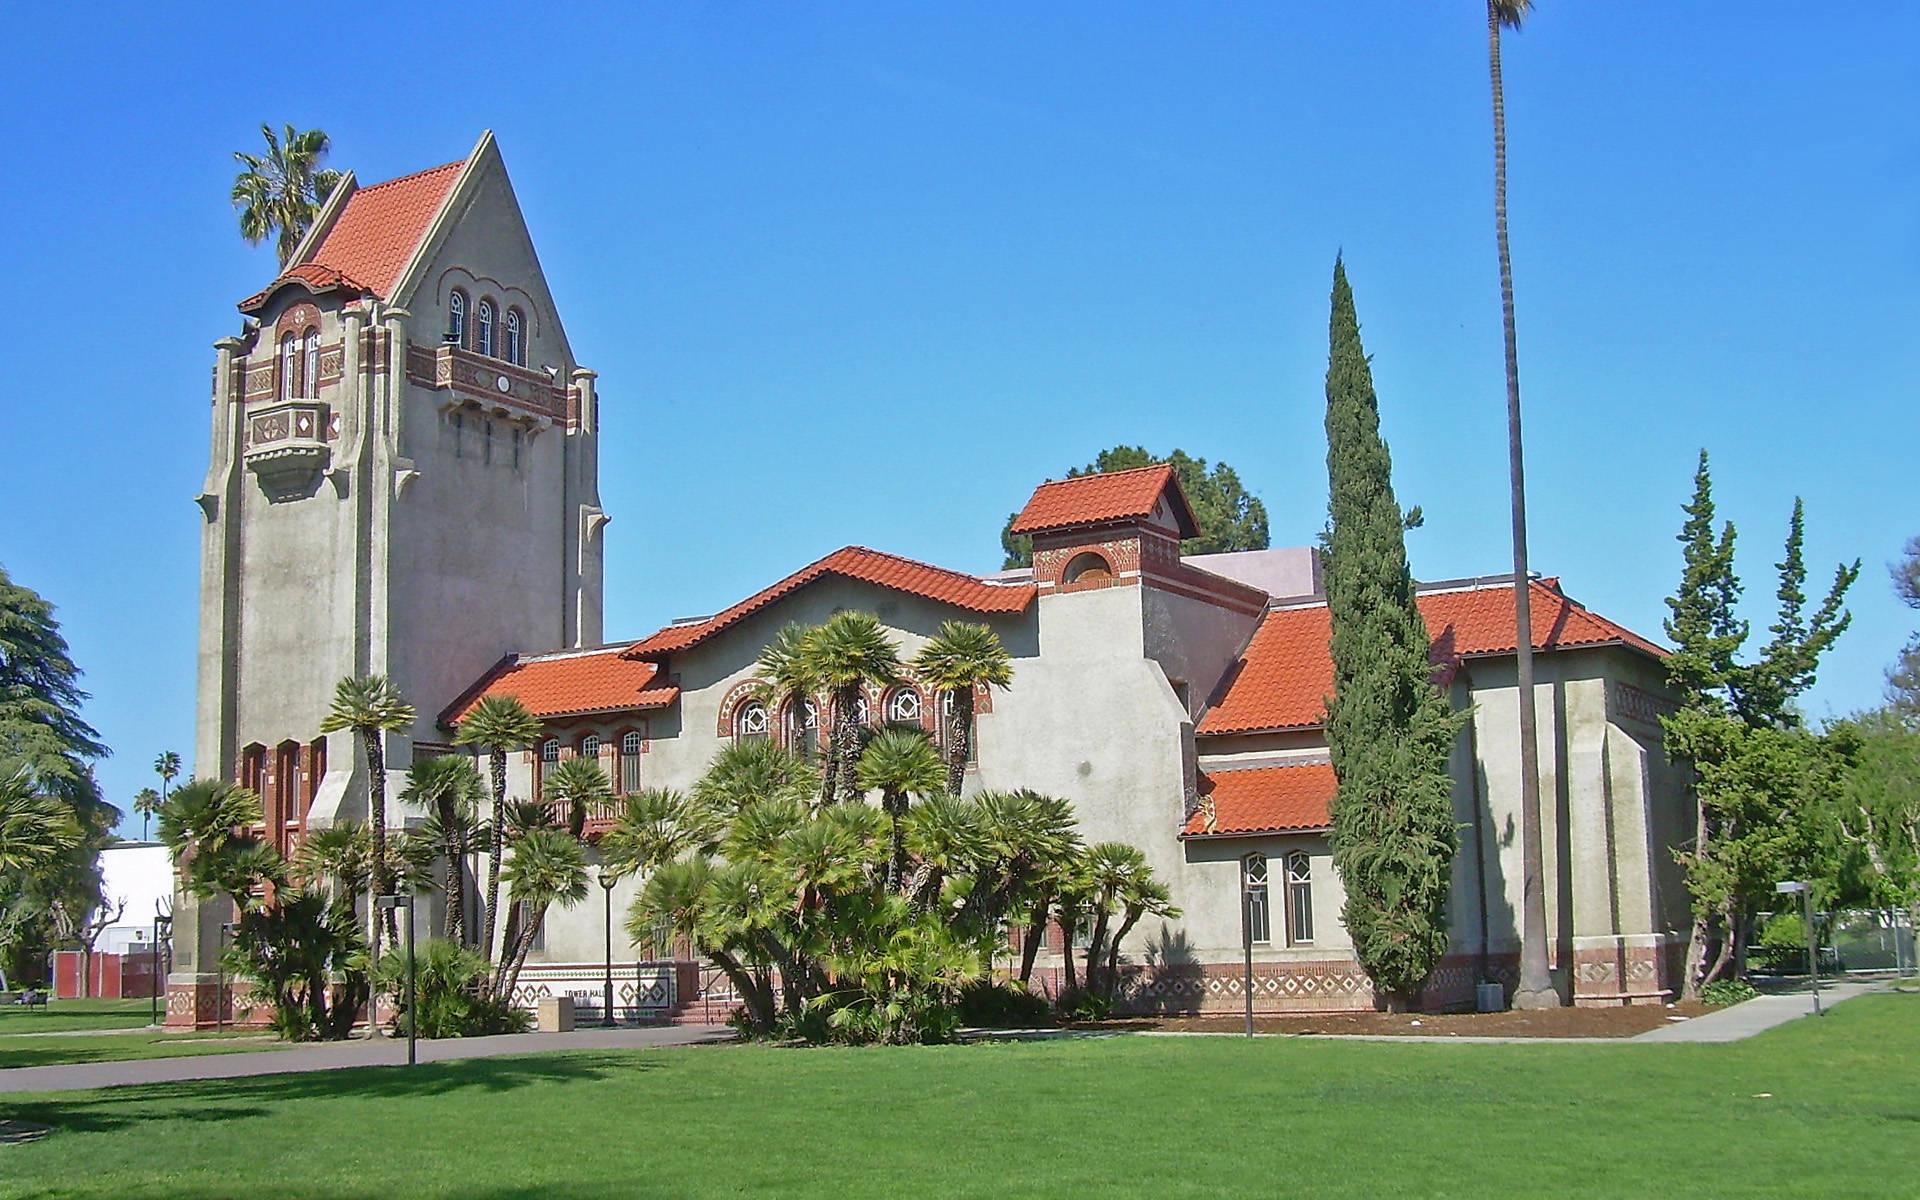 SJSU tower hall at city of San Jose California USA city wallpaper 1920x1200